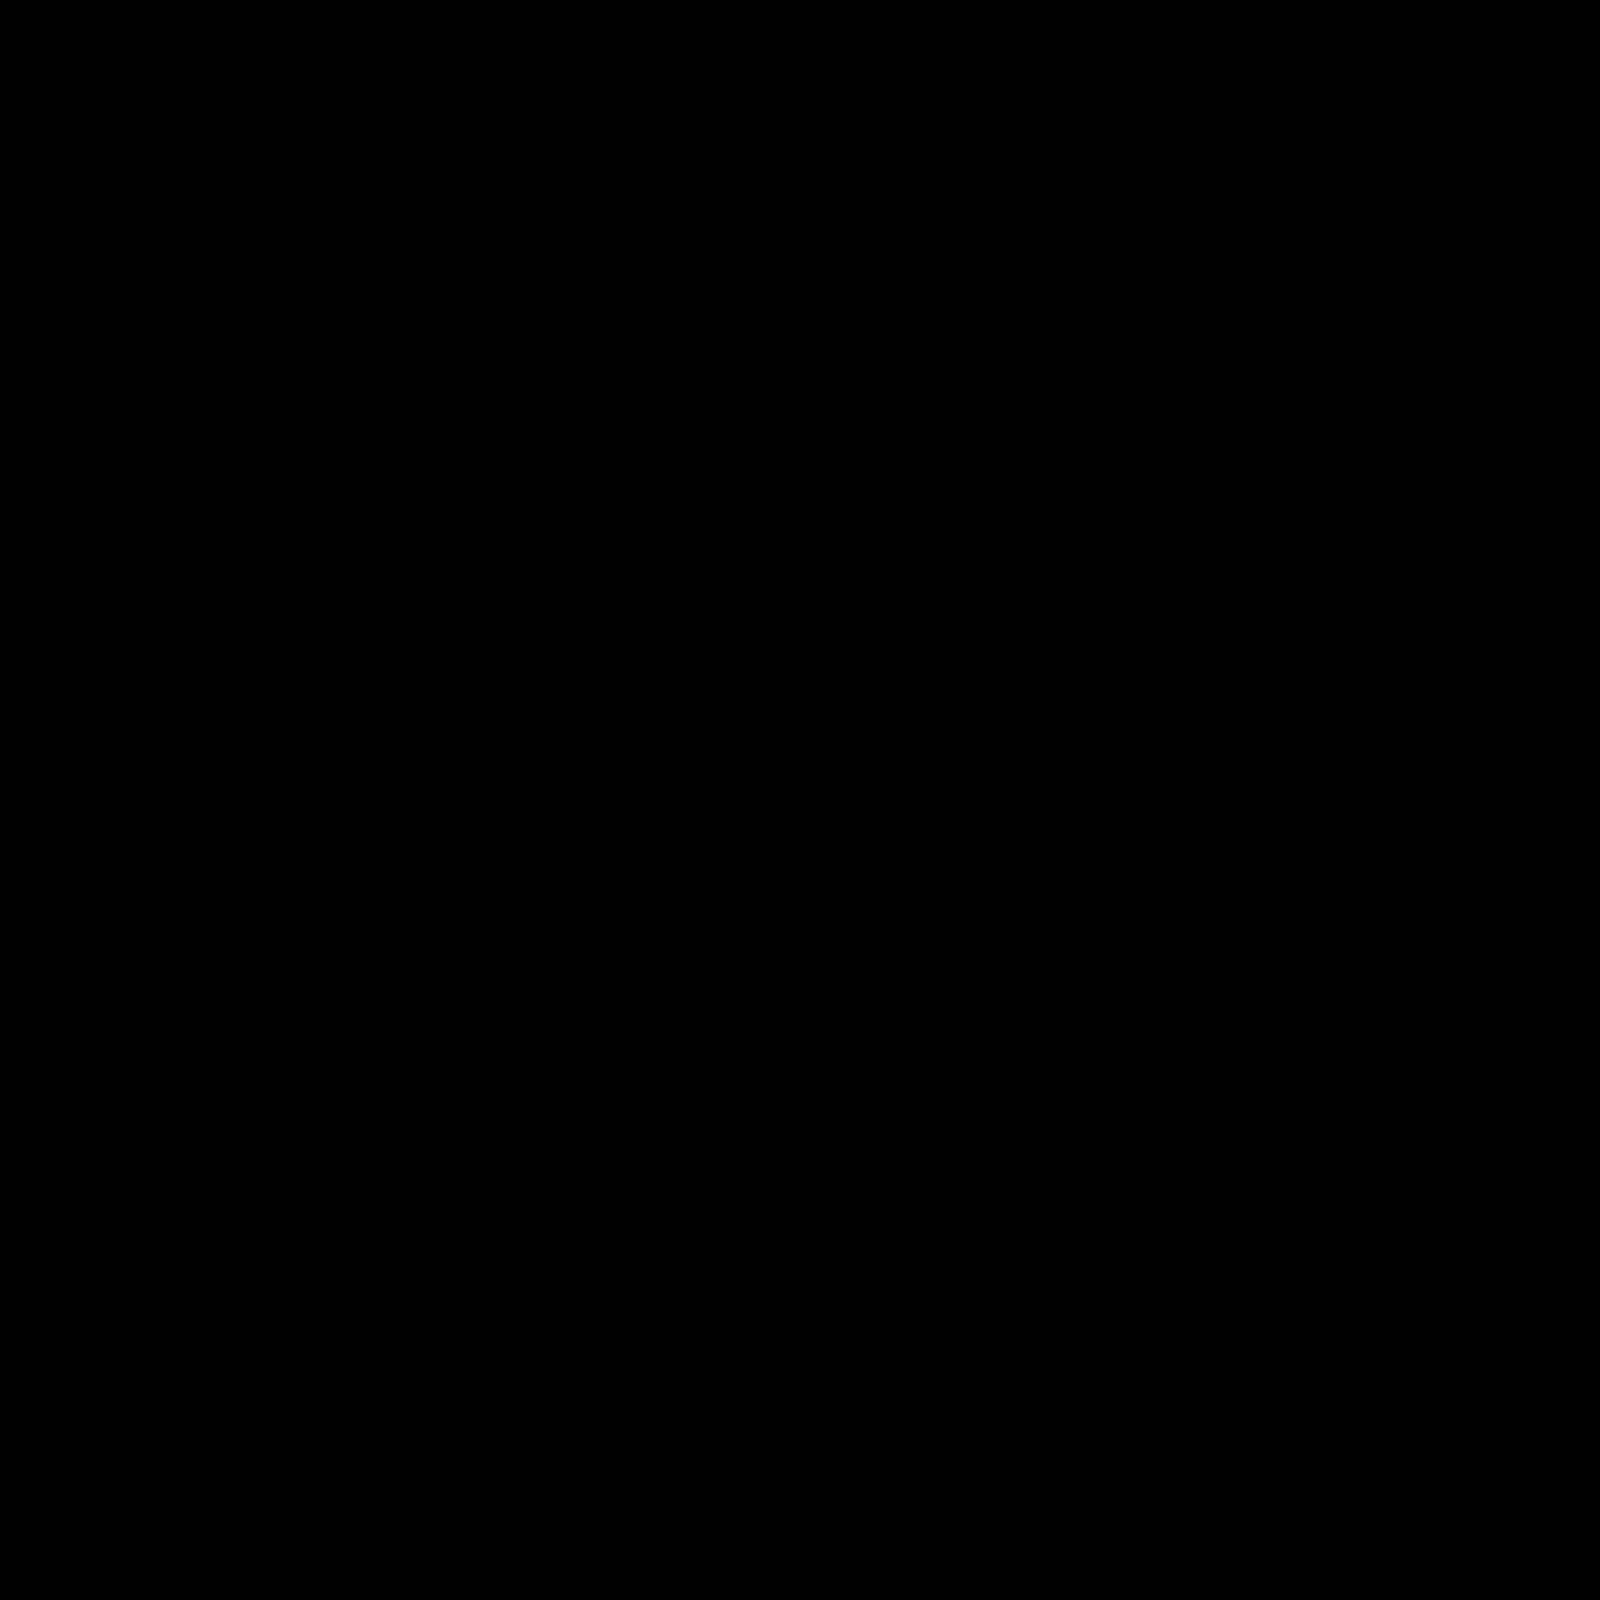 Katakana I icon